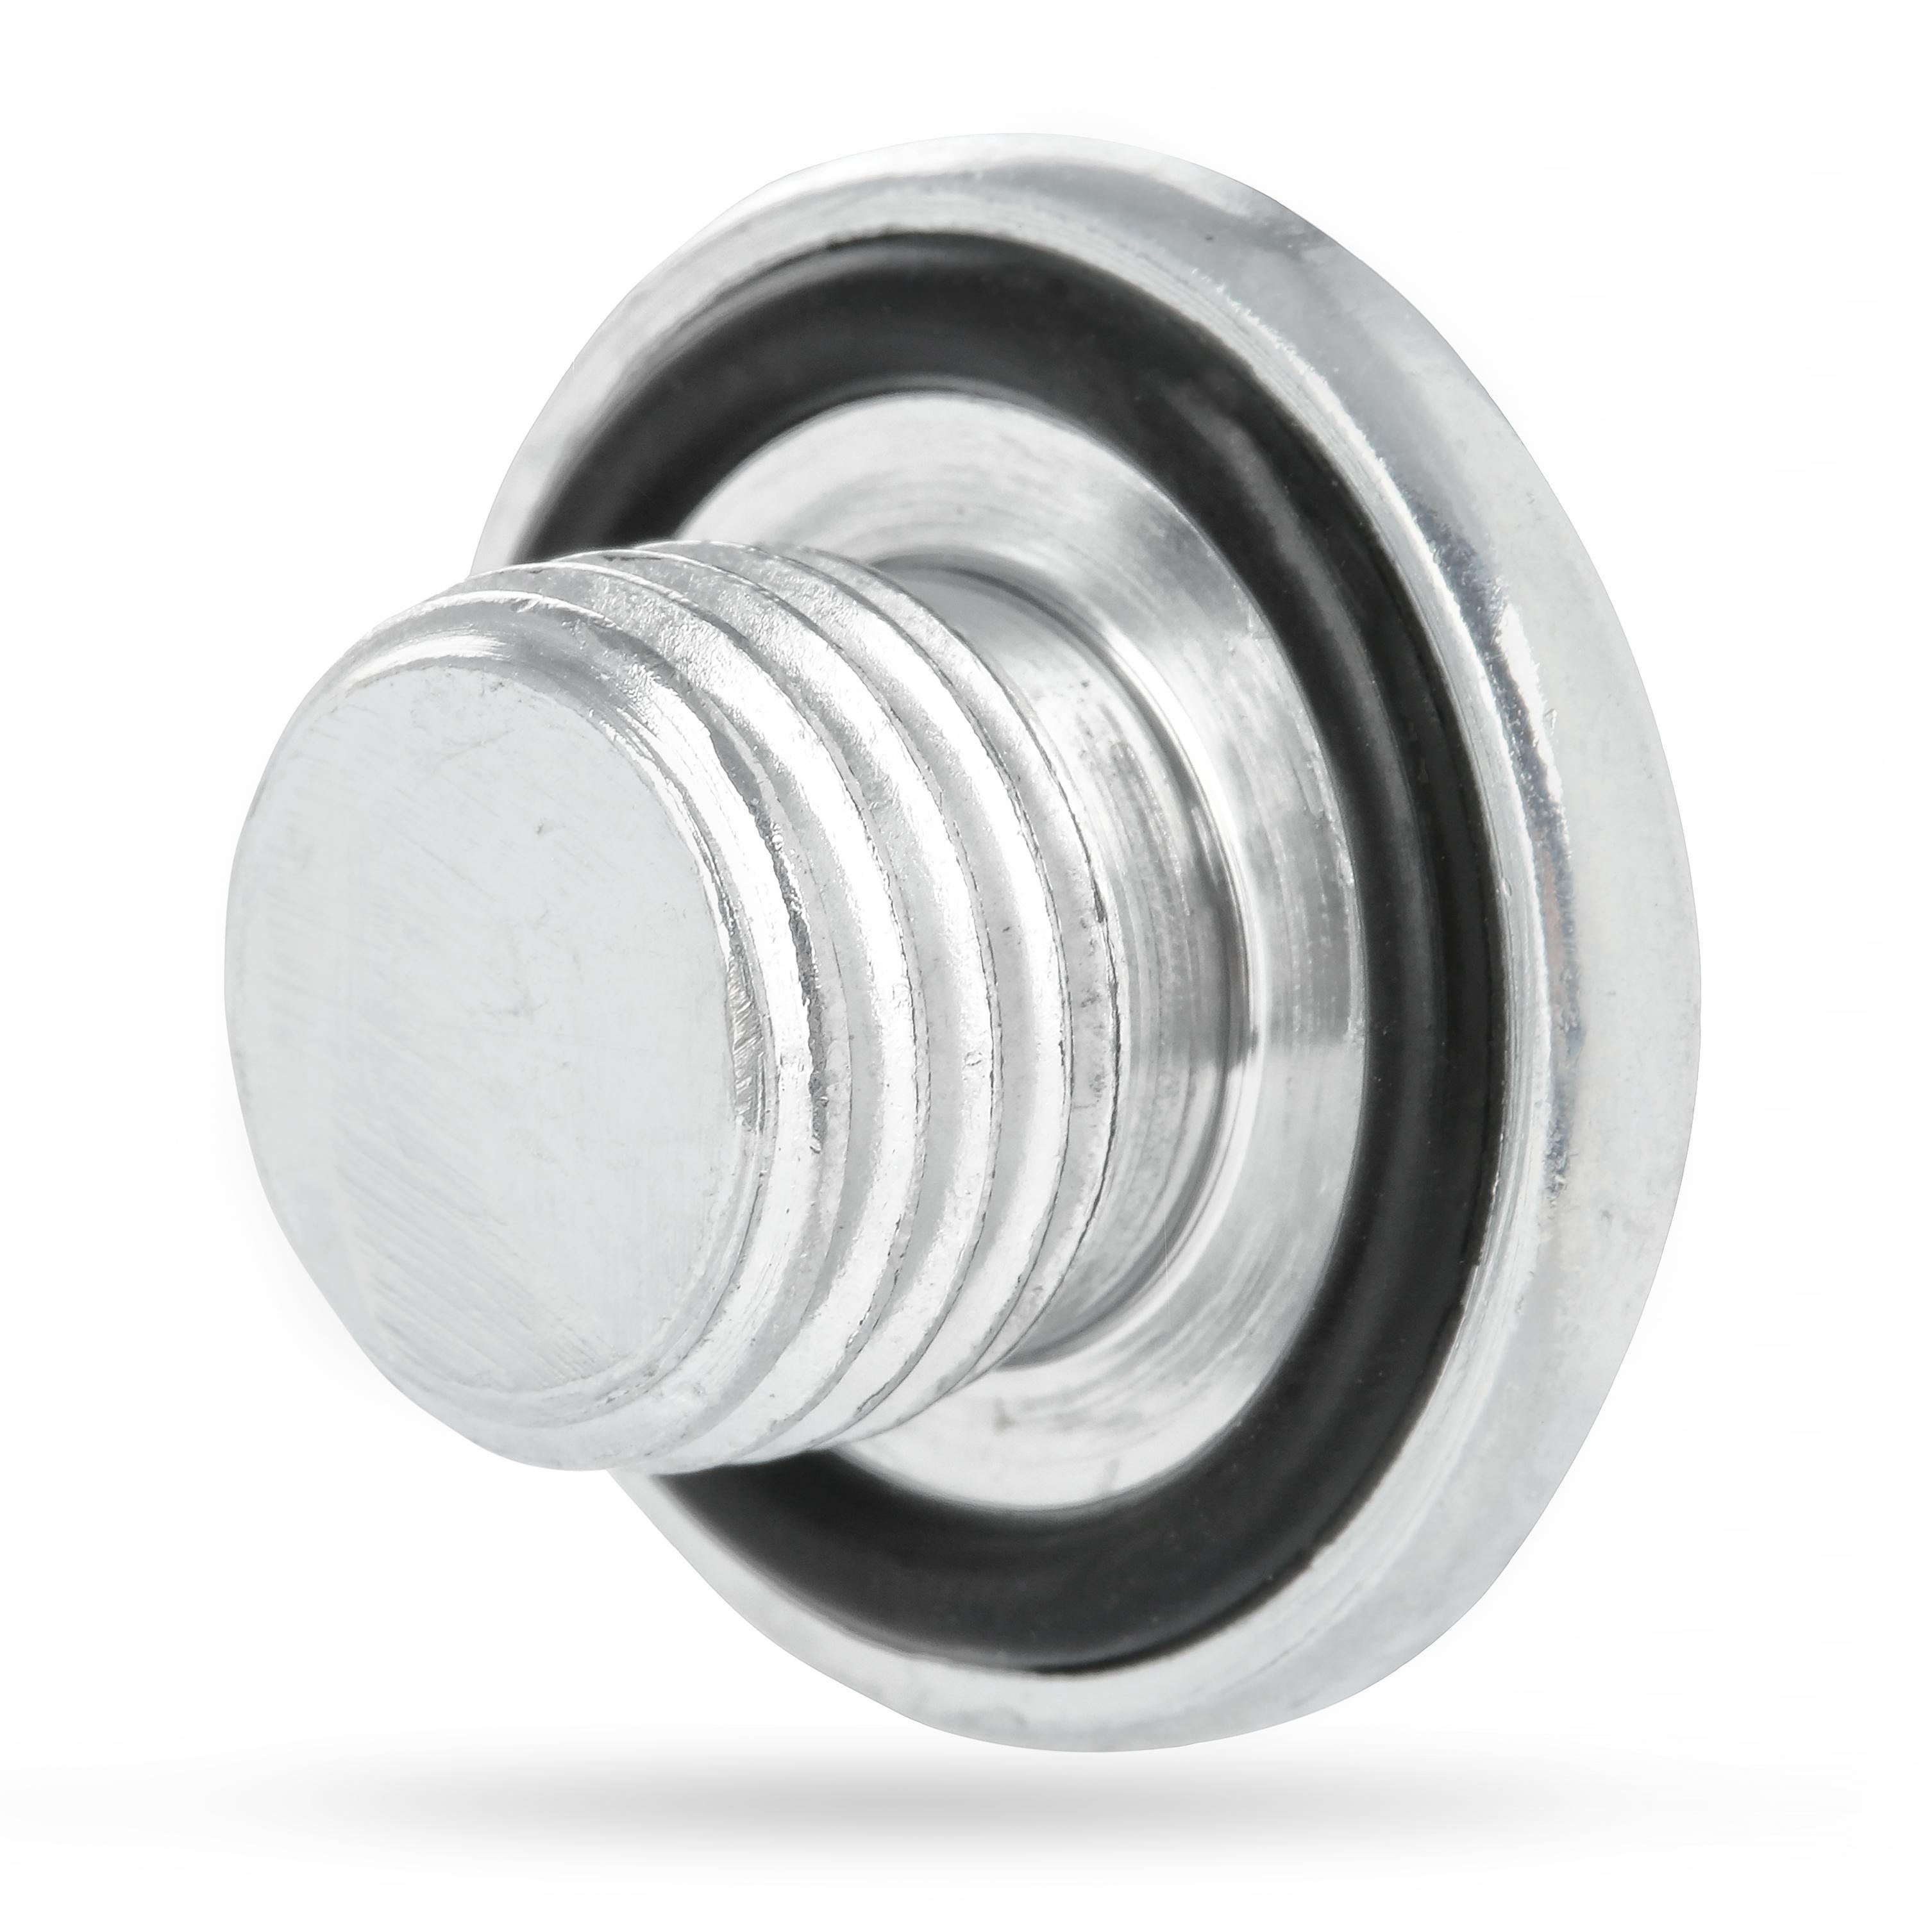 Drain Plug 1213800200 JP GROUP 1213800200 original quality